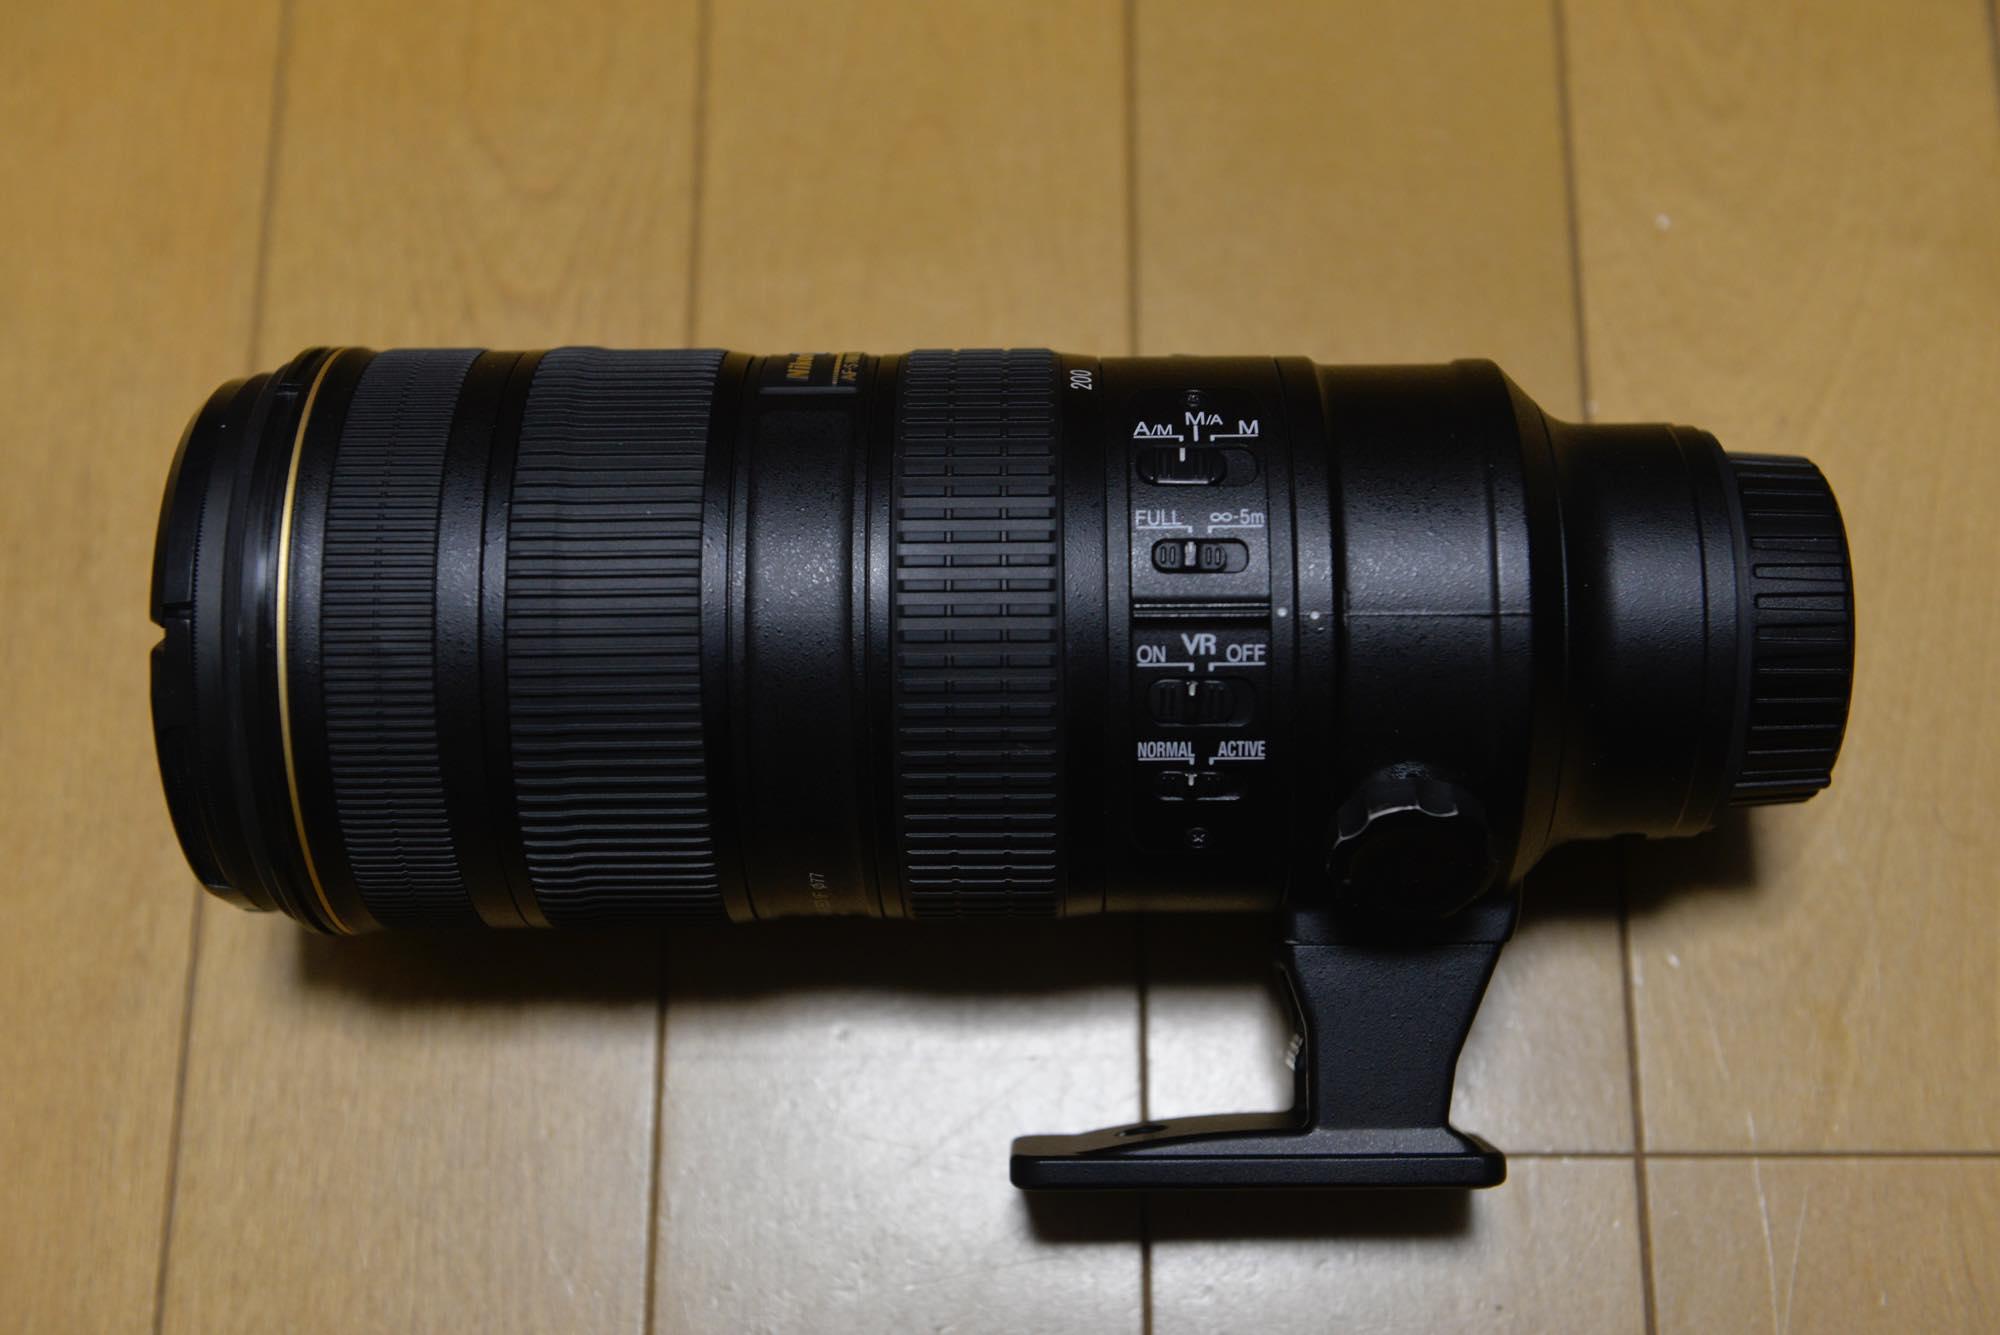 NIKKOR 70-200mm f/2.8G ED VR II購入!!これで風景もポートレートもばっちし!